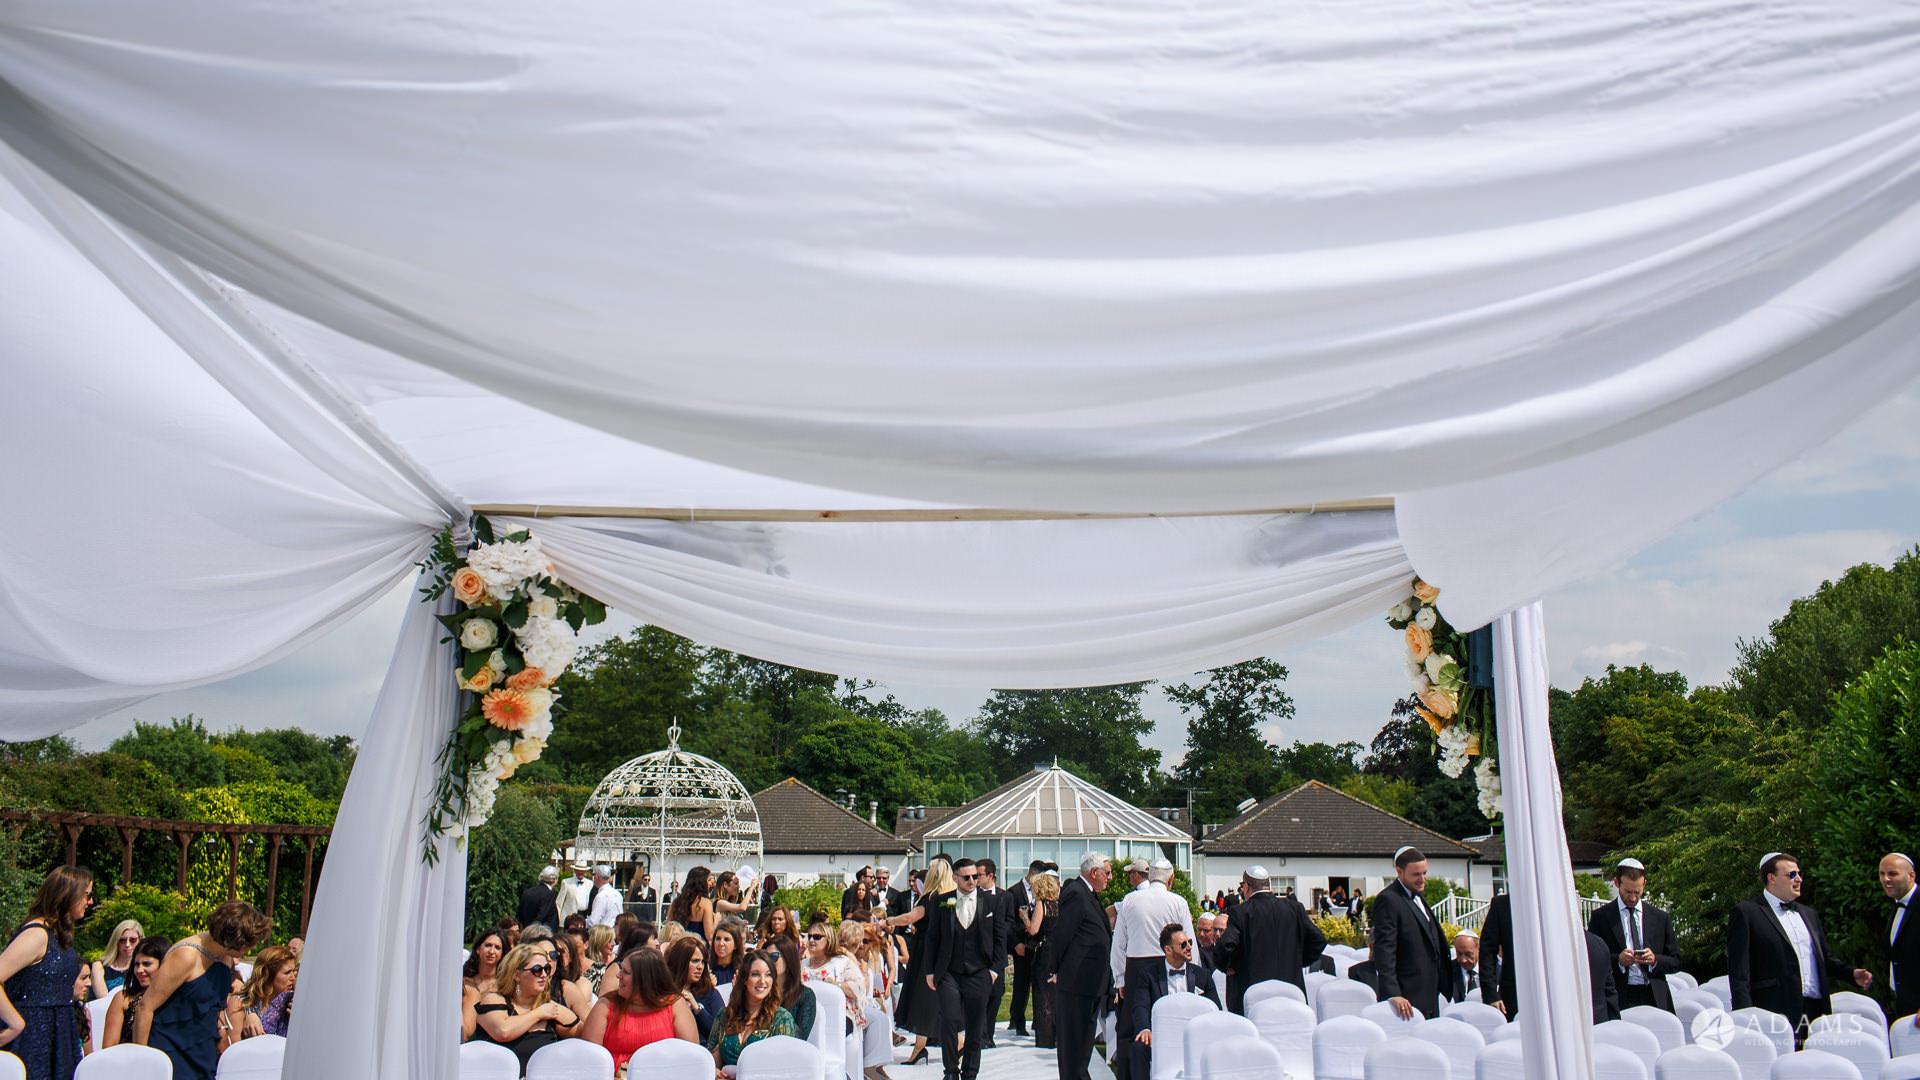 Jewish Wedding at Manor of Groves Wedding Photography   Candice + Doron 73